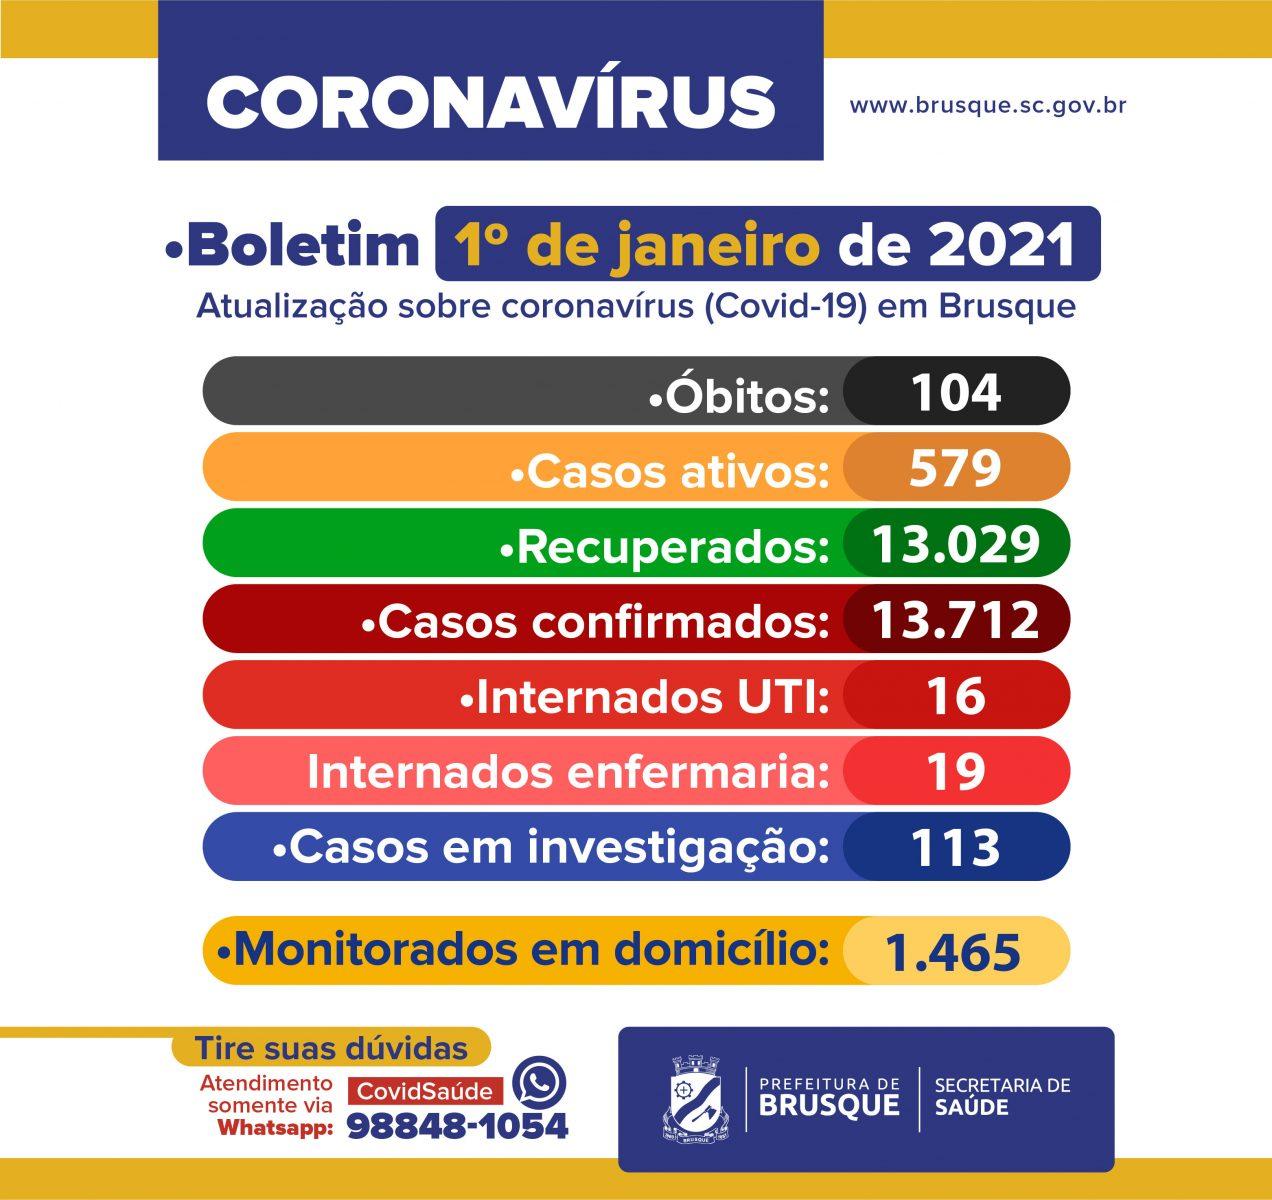 Covid-19: Confira o boletim epidemiológico desta sexta-feira (01)